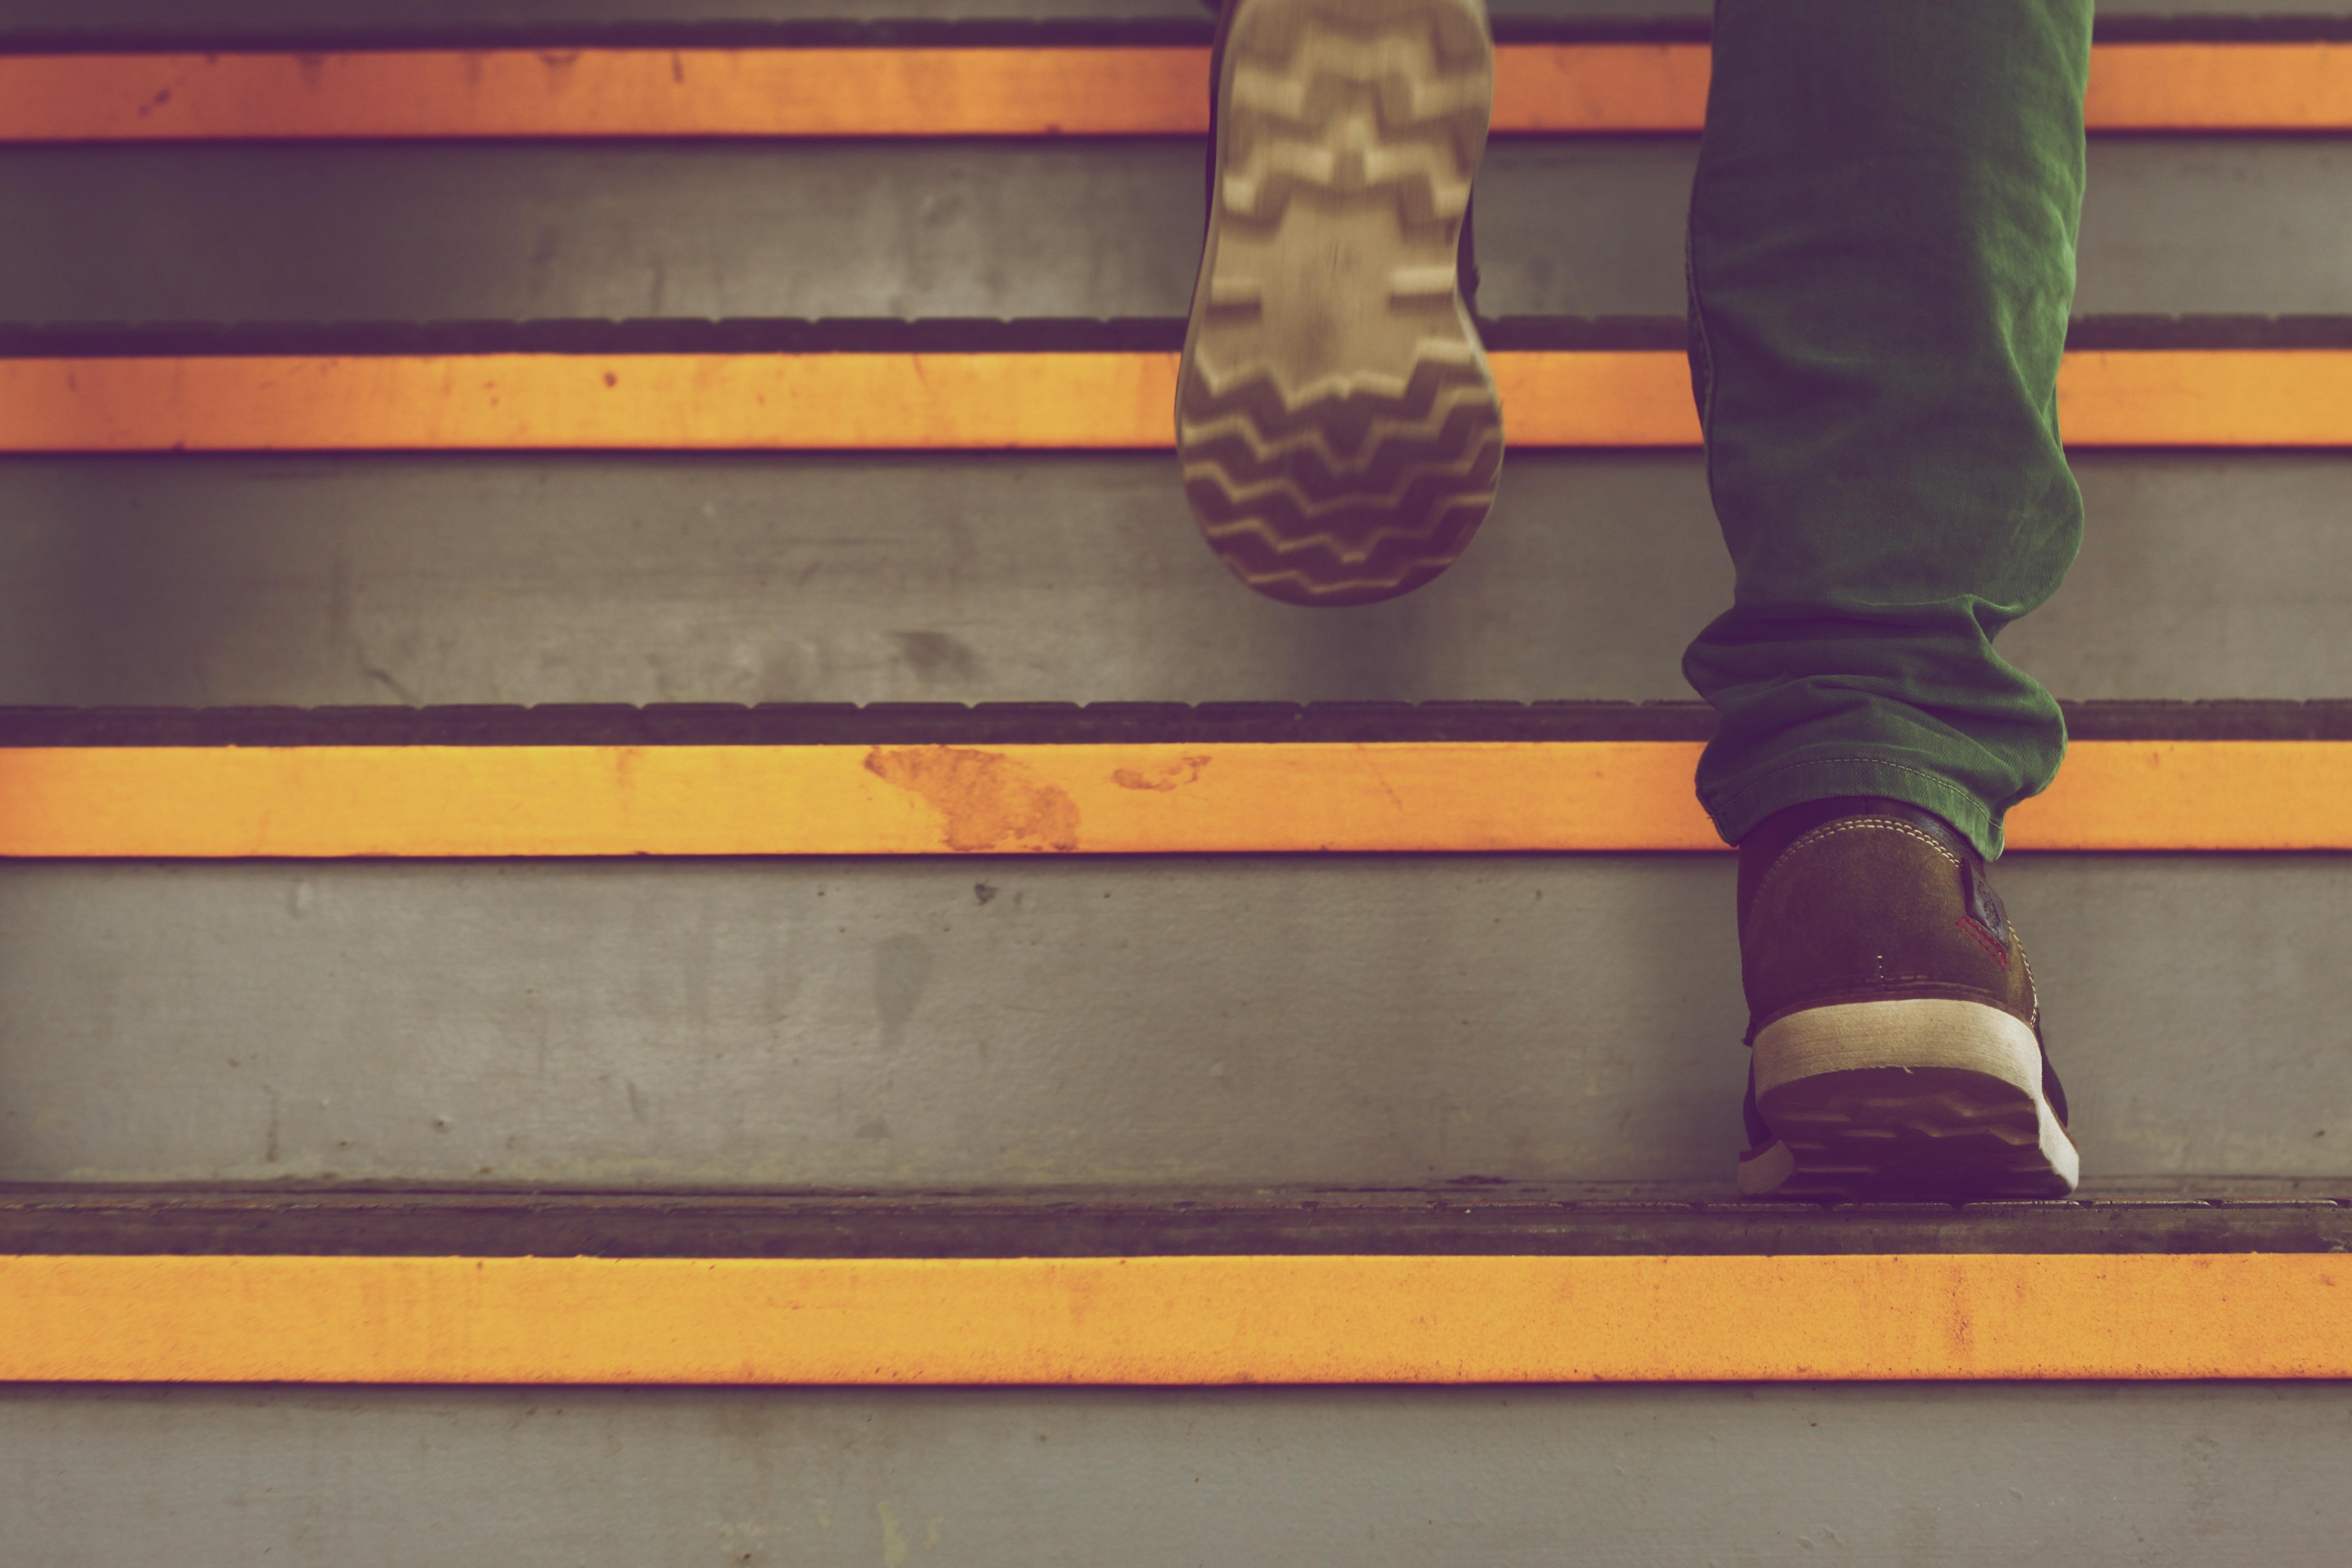 free images walking wood floor number wall steps line jeans